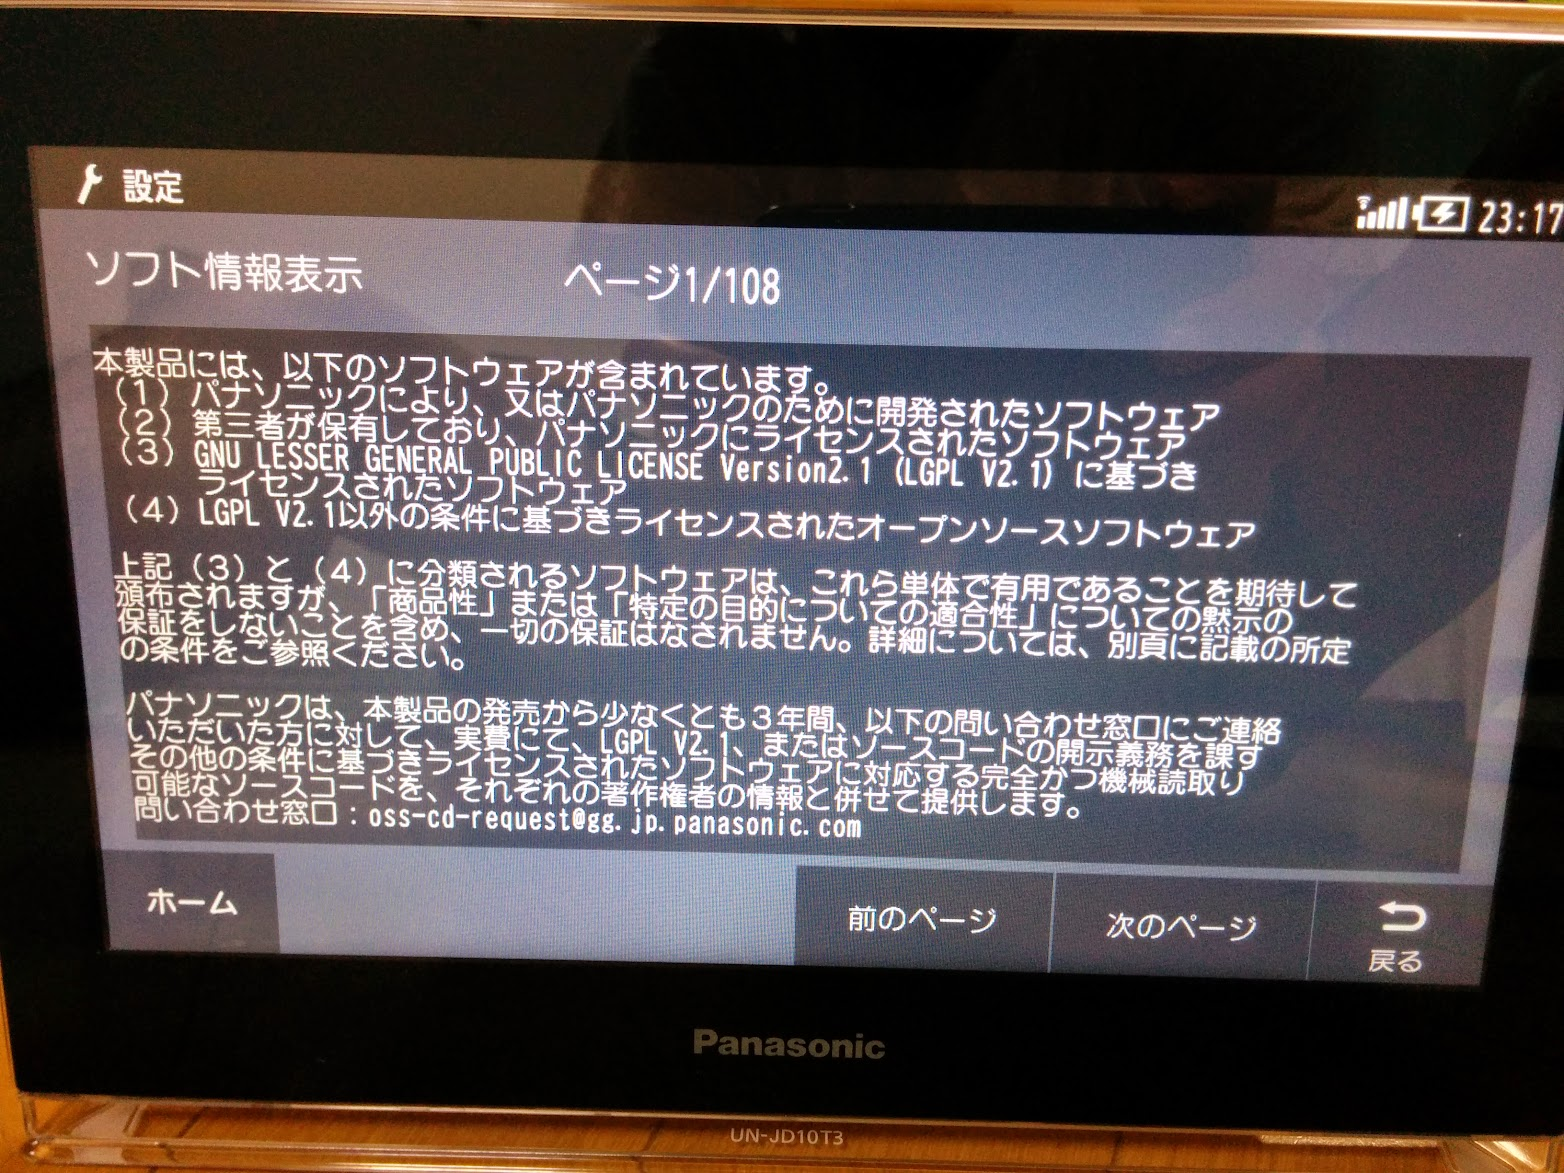 https://lh3.googleusercontent.com/-cFYsJTX-HXk/U5VzsxJkfiI/AAAAAAAAHuM/tFZo-Vp7YhE/w1564-h1174-no/20140527_231717_Android.jpg